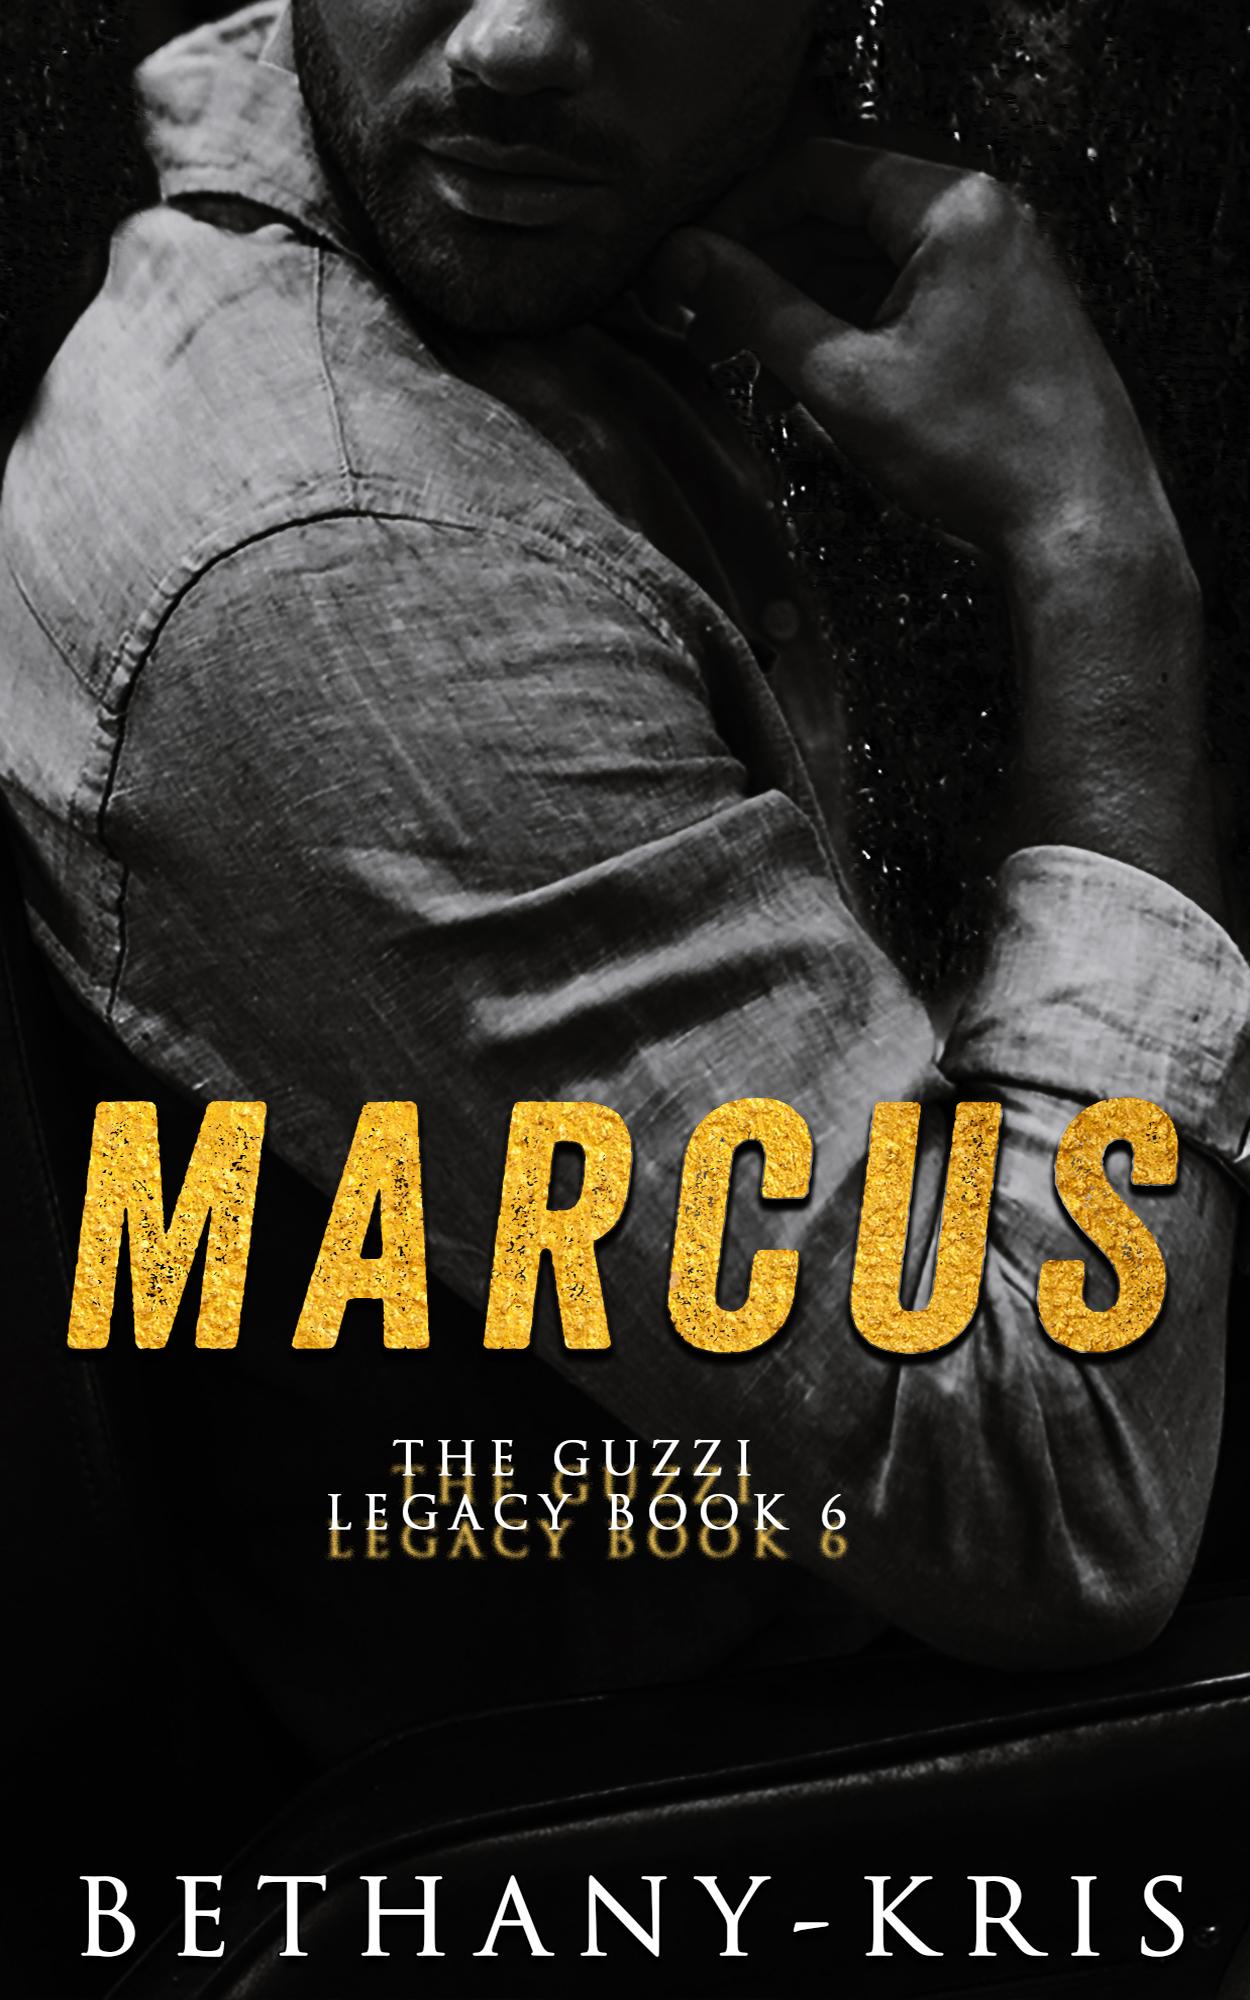 Bethany-Kris - The Guzzi Legacy 6 - Marcus